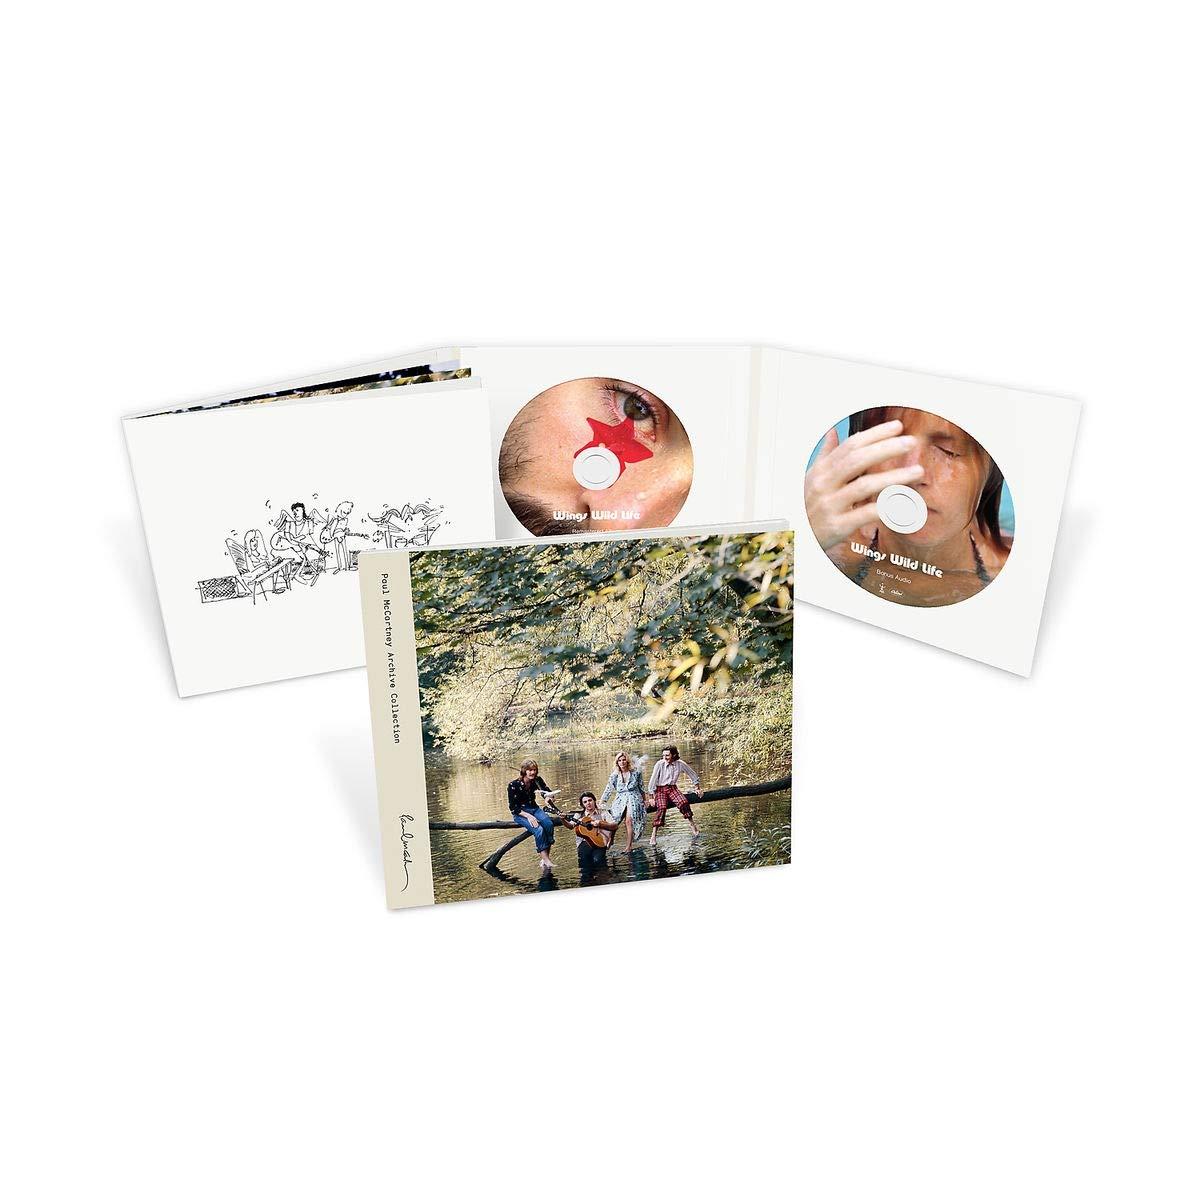 CD : Paul McCartney & Wings - Wild Life